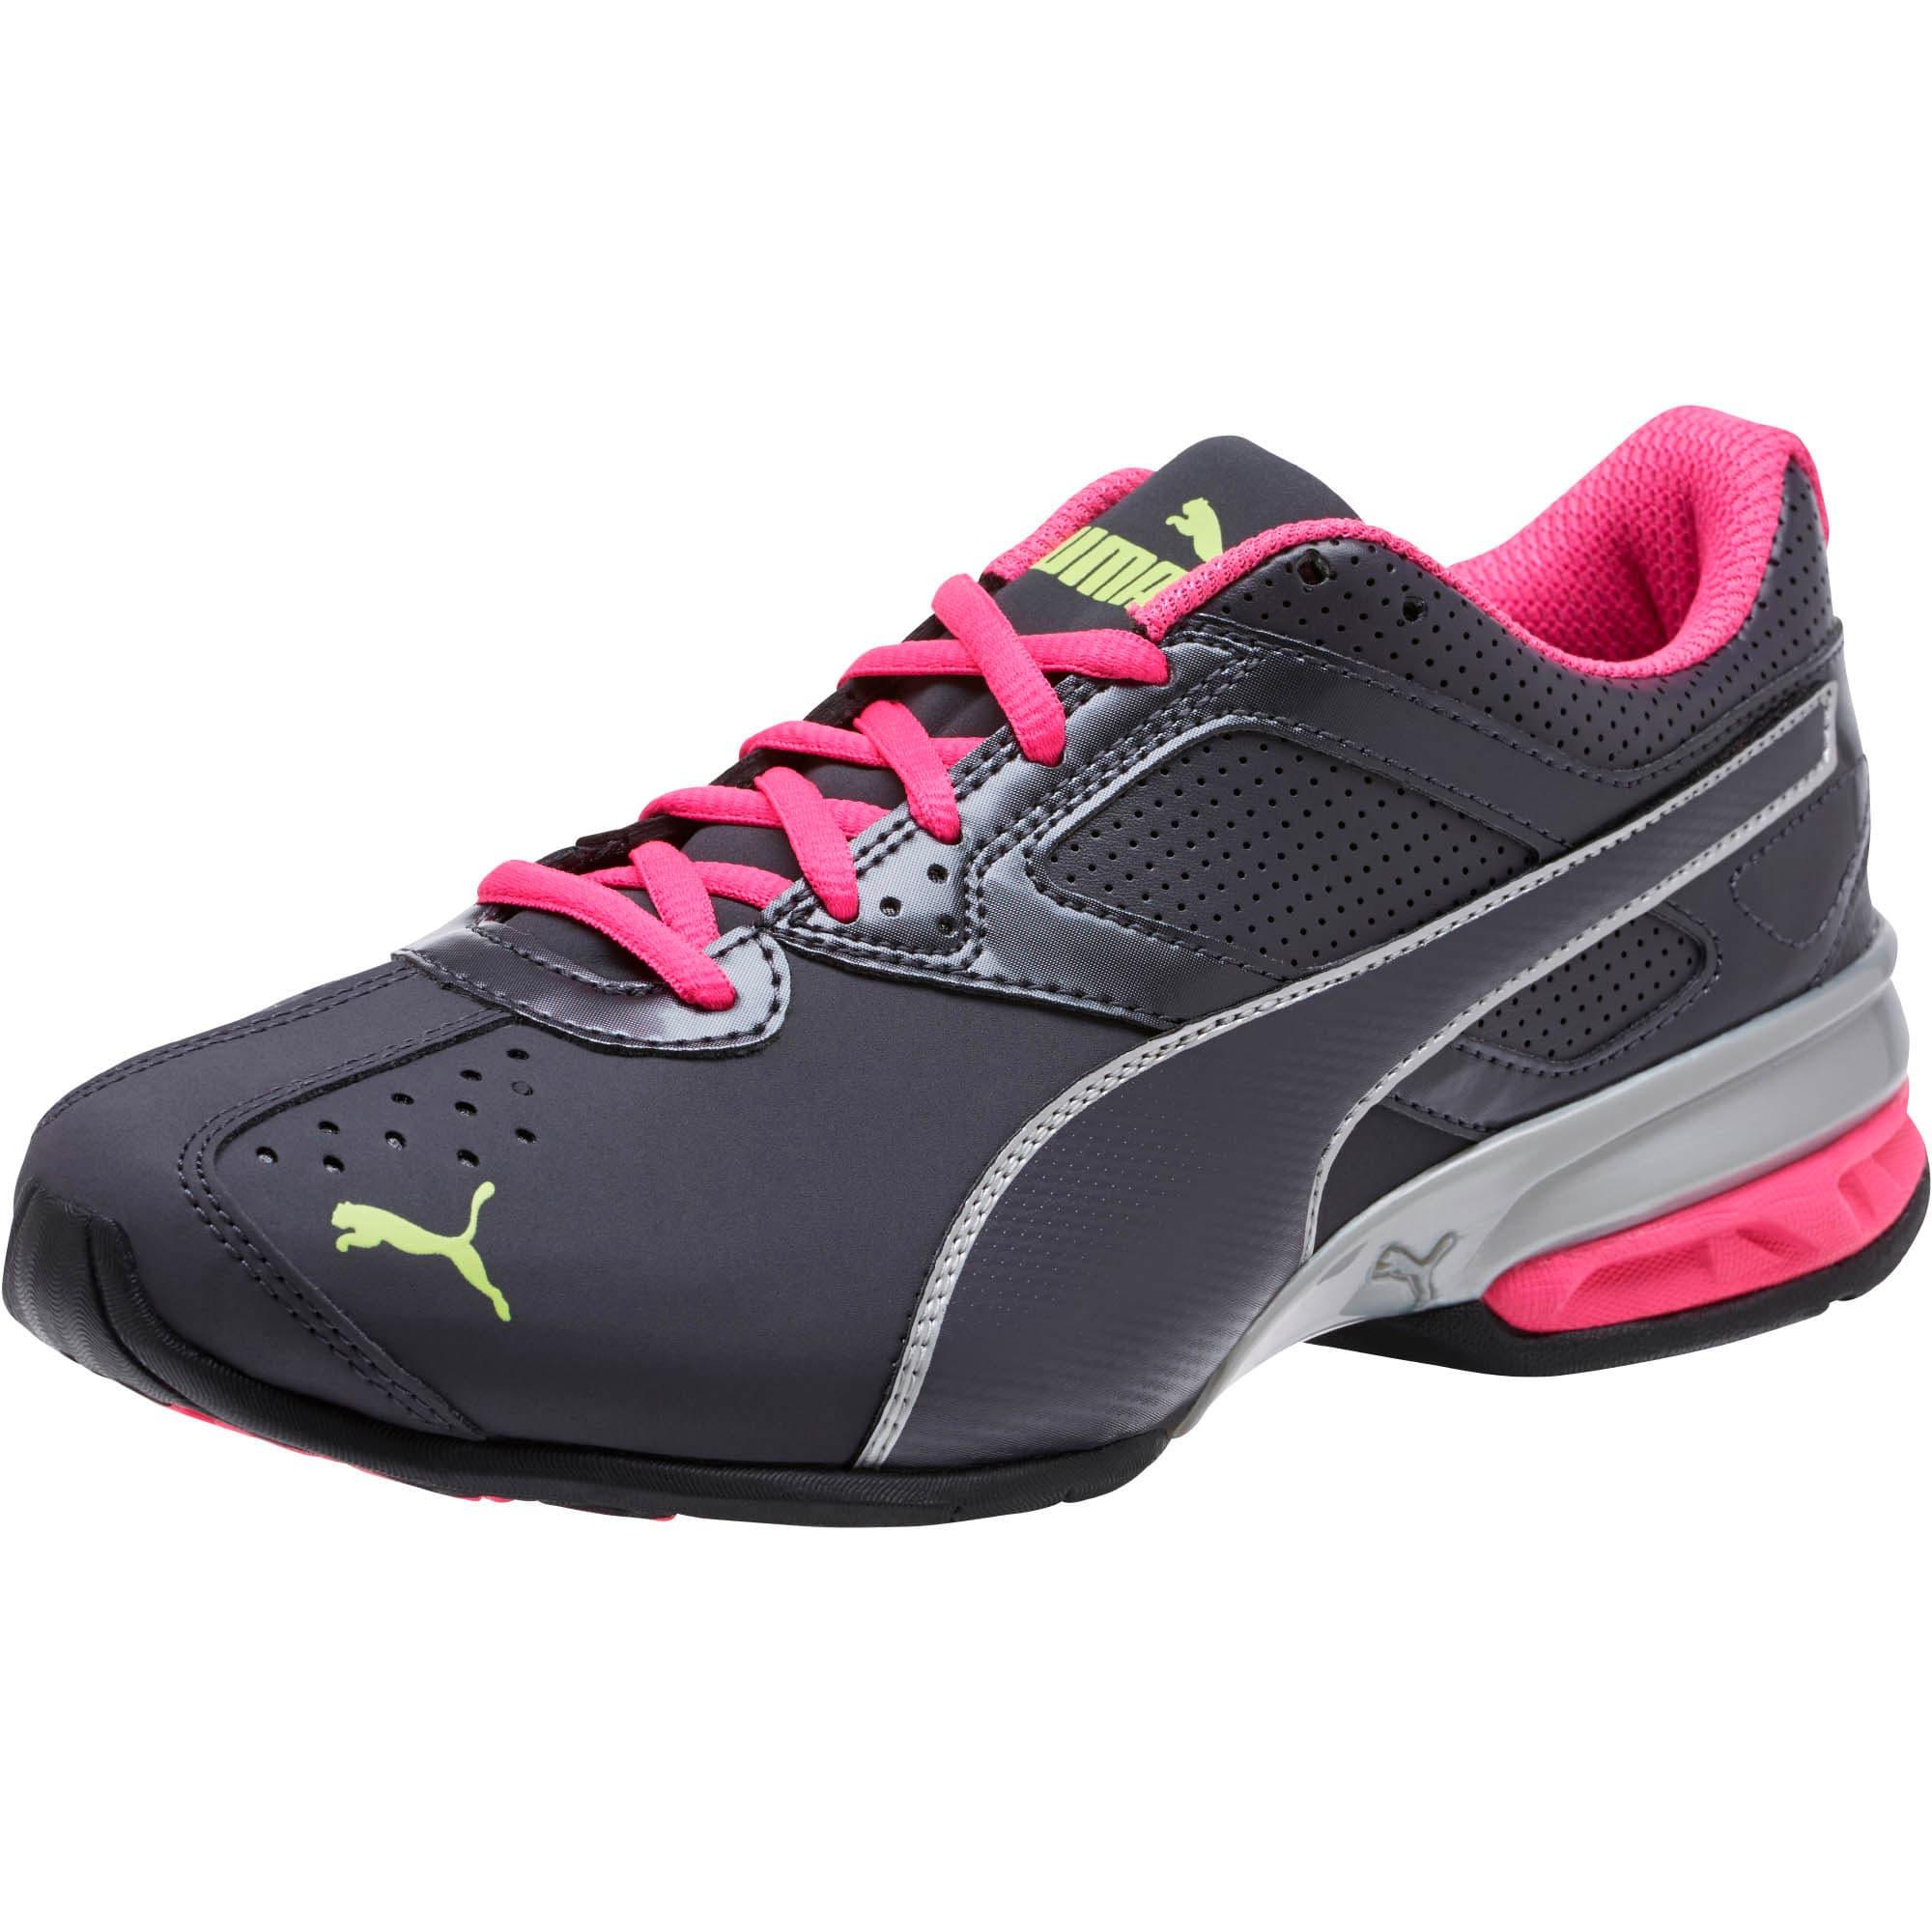 Thumbnail 1 of Tazon 6 FM Women's Sneakers, Periscope-Silver-Pink Glo, medium